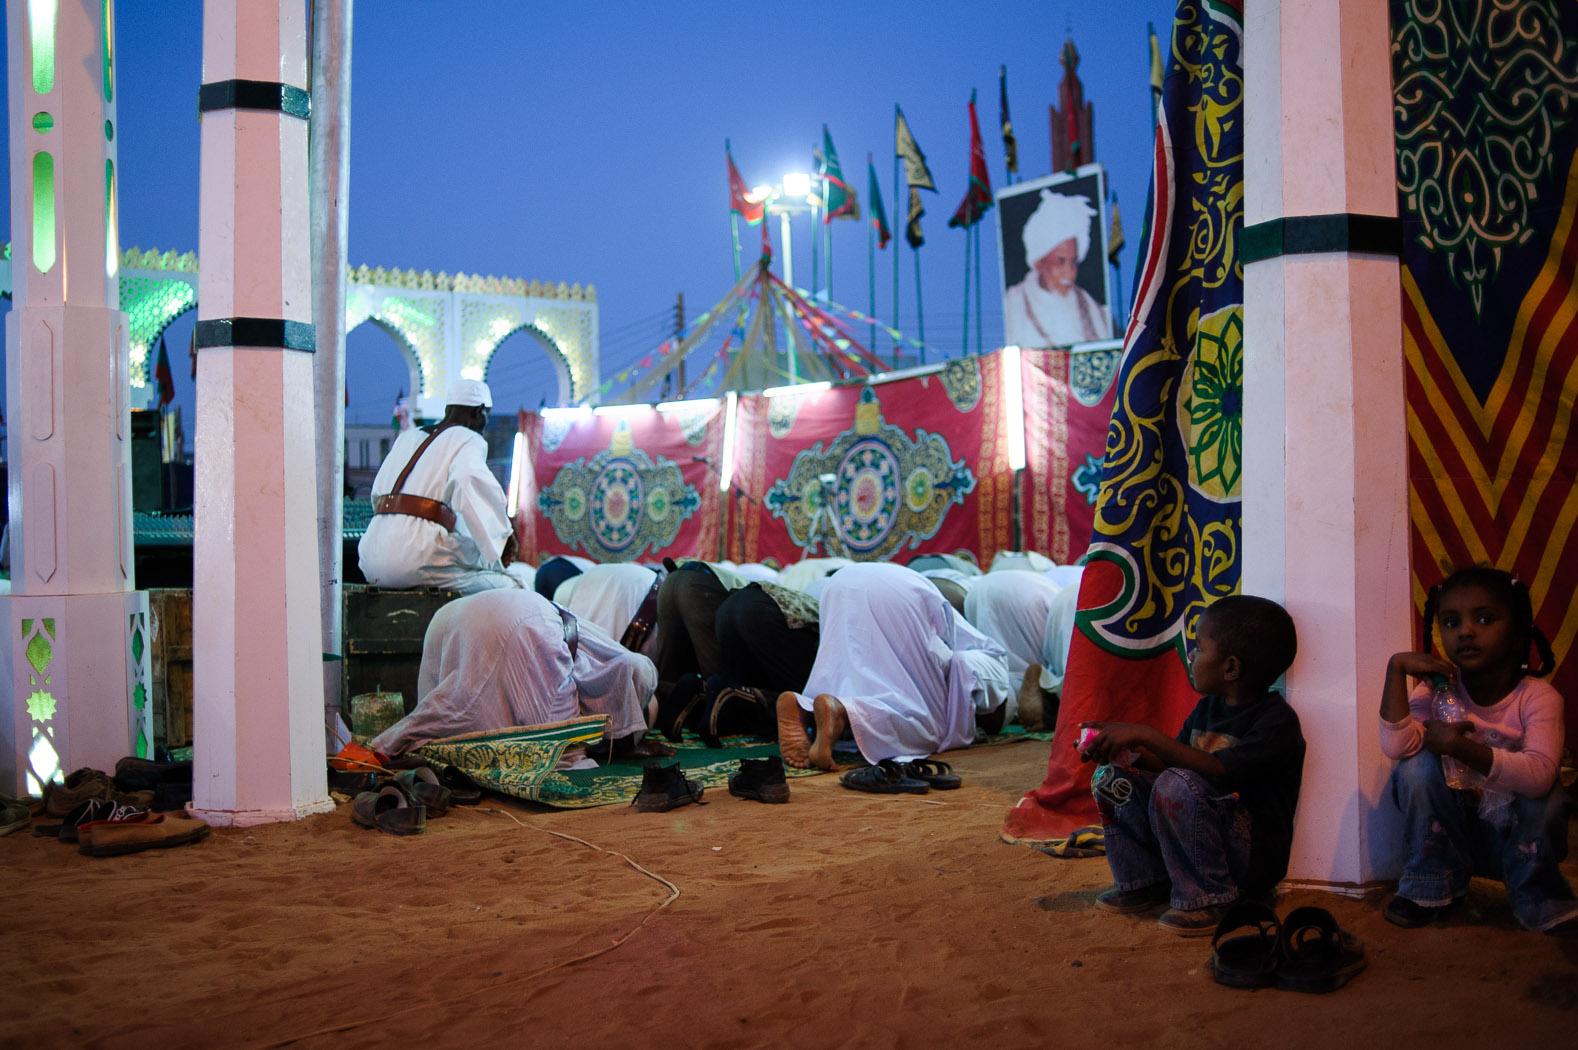 Children sit as men pray during Mawlid celebrations in Sudan.